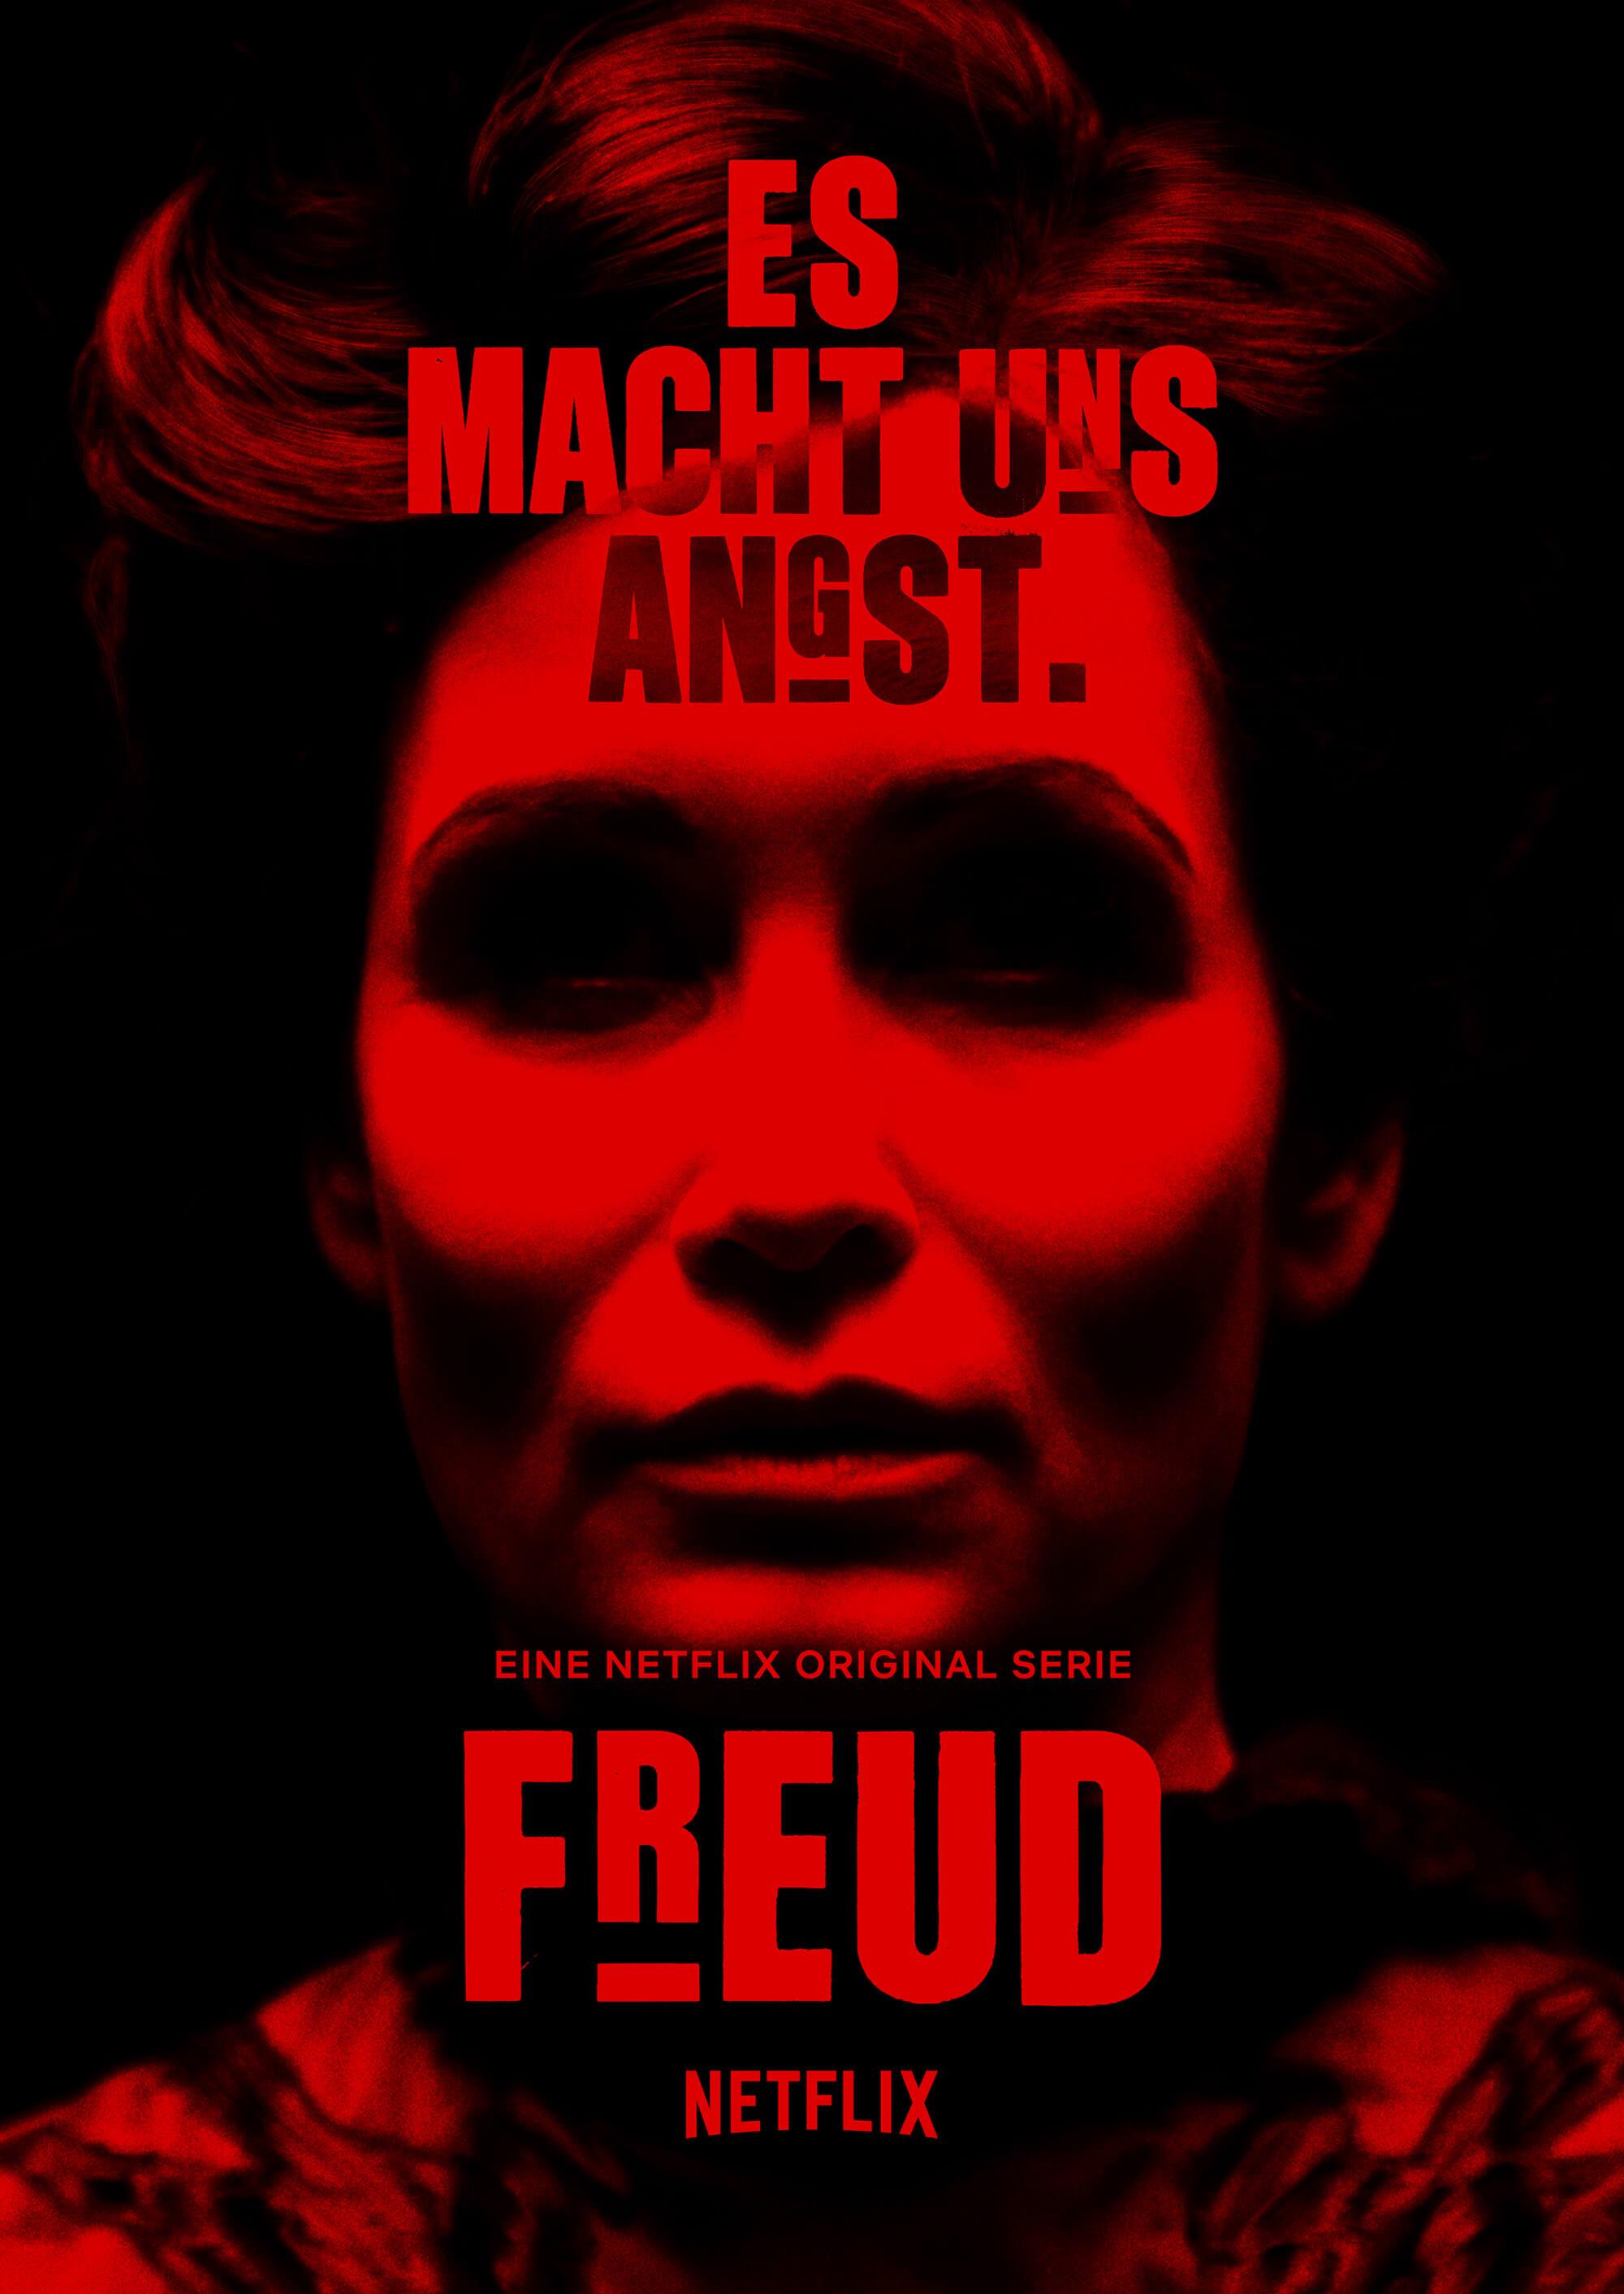 8490_FREUD_Characters_Freud_Dark_SmallSized_Headline_Szápáry